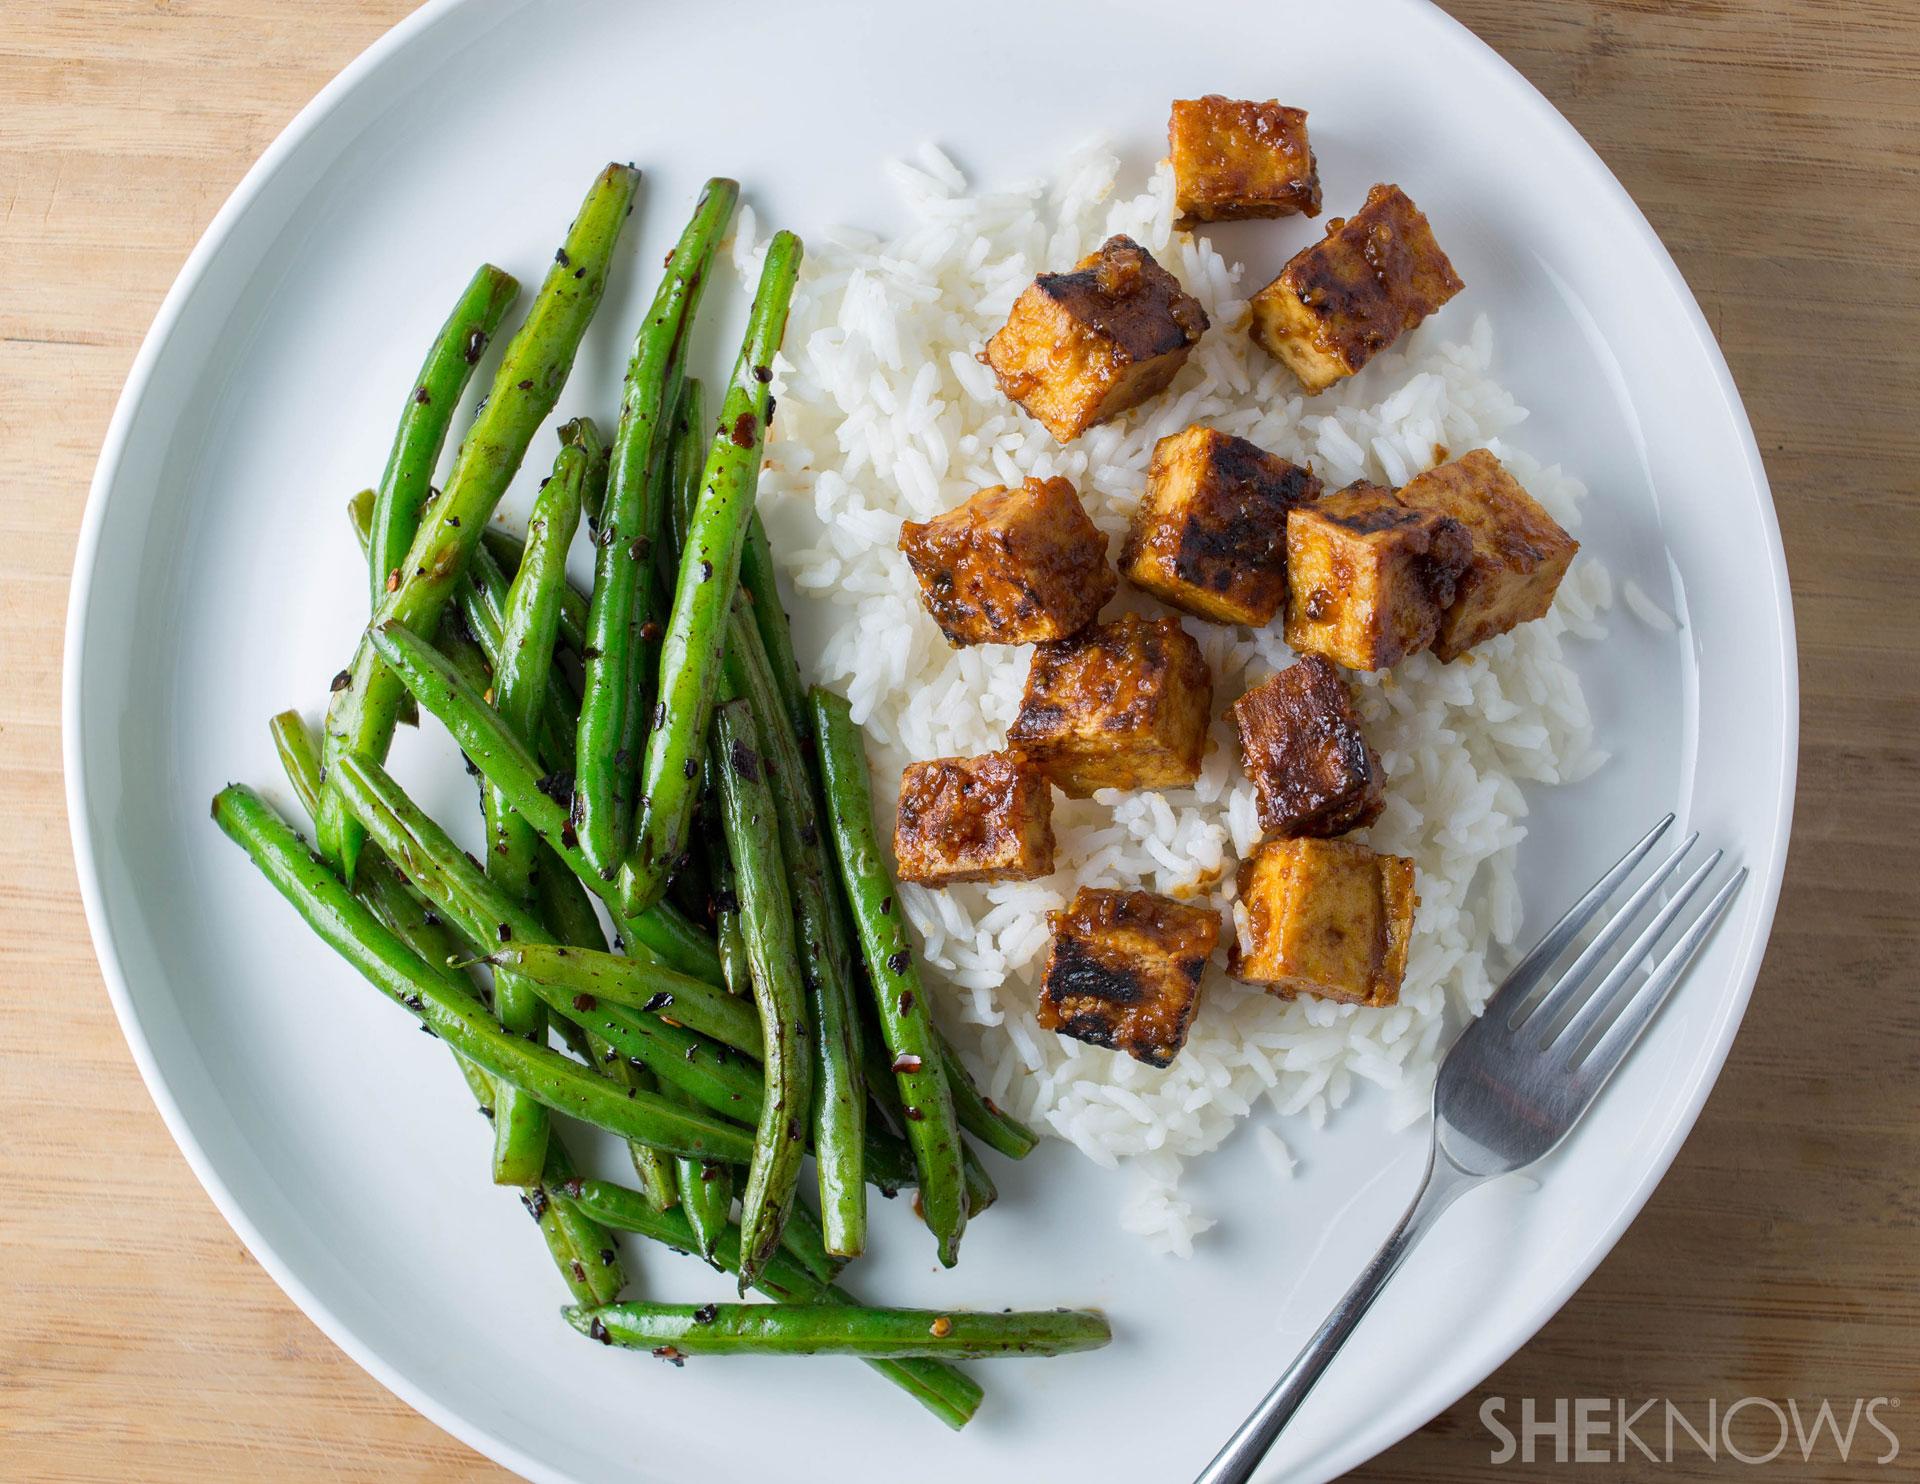 Weeknight vegan dinner